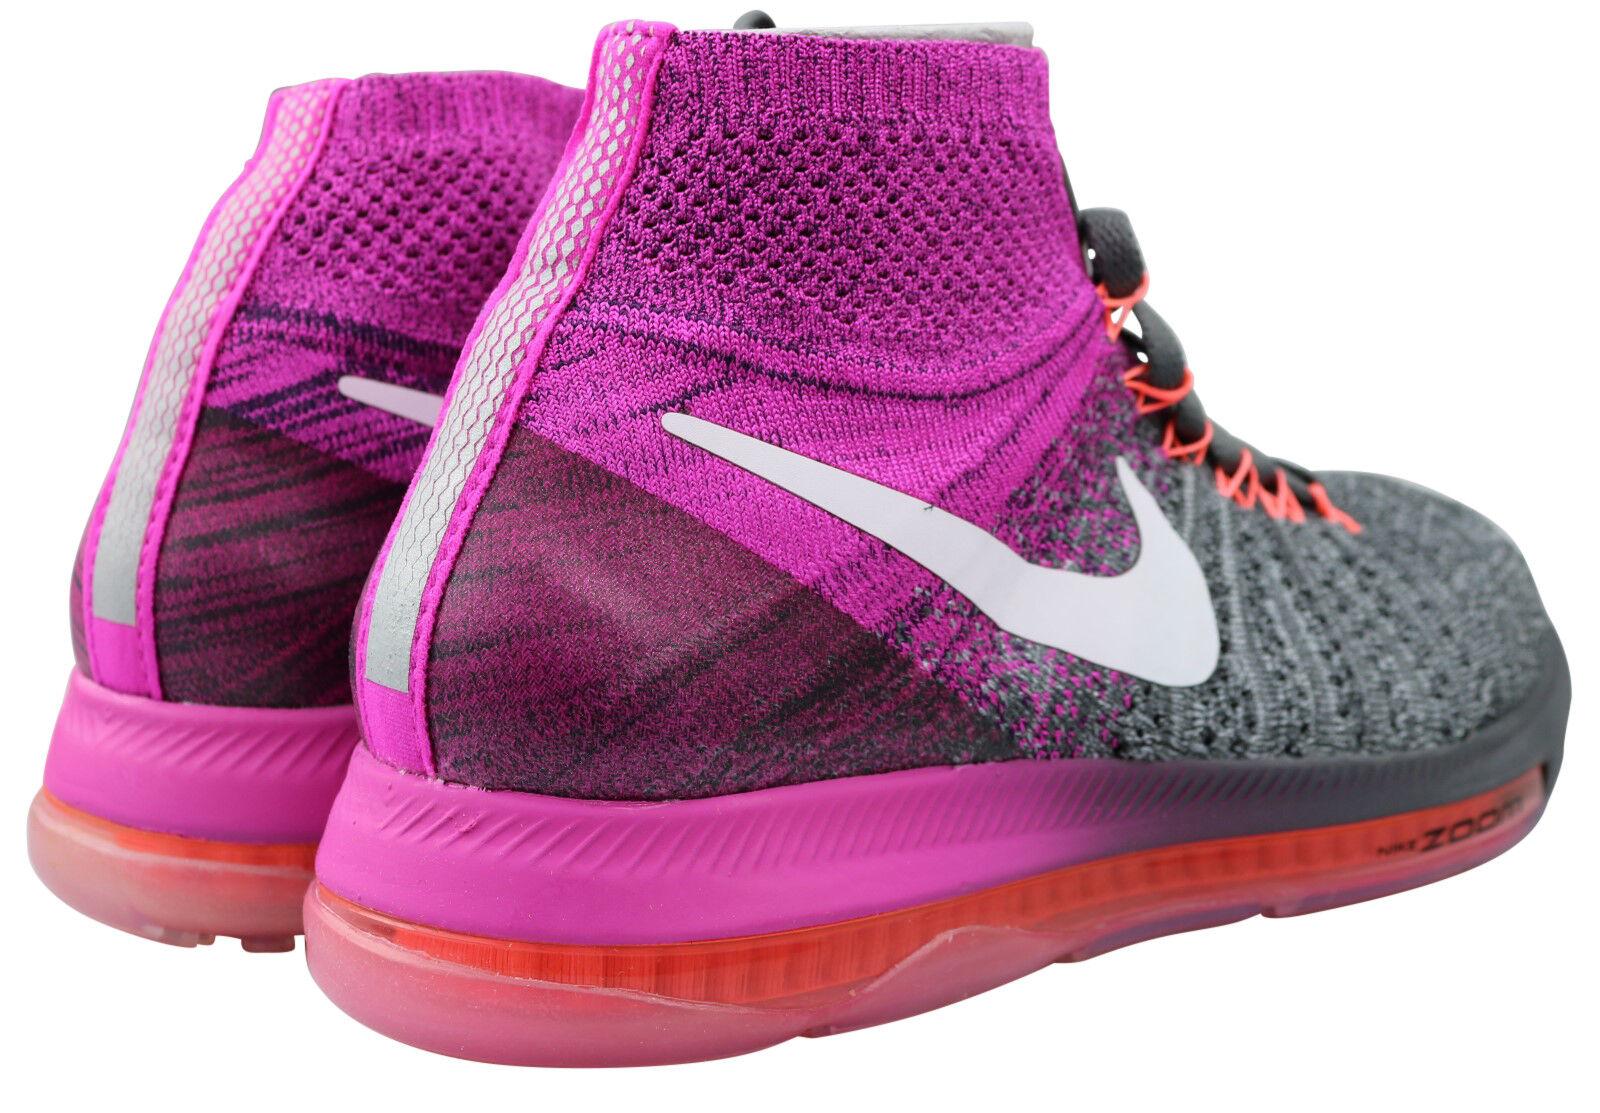 Nike Wmns Zoom All Out Flyknit baskets baskets baskets Femmes 845361-004 T 36,5 - 40,5 NOUVEAU & NEUF dans sa boîte f15a2b